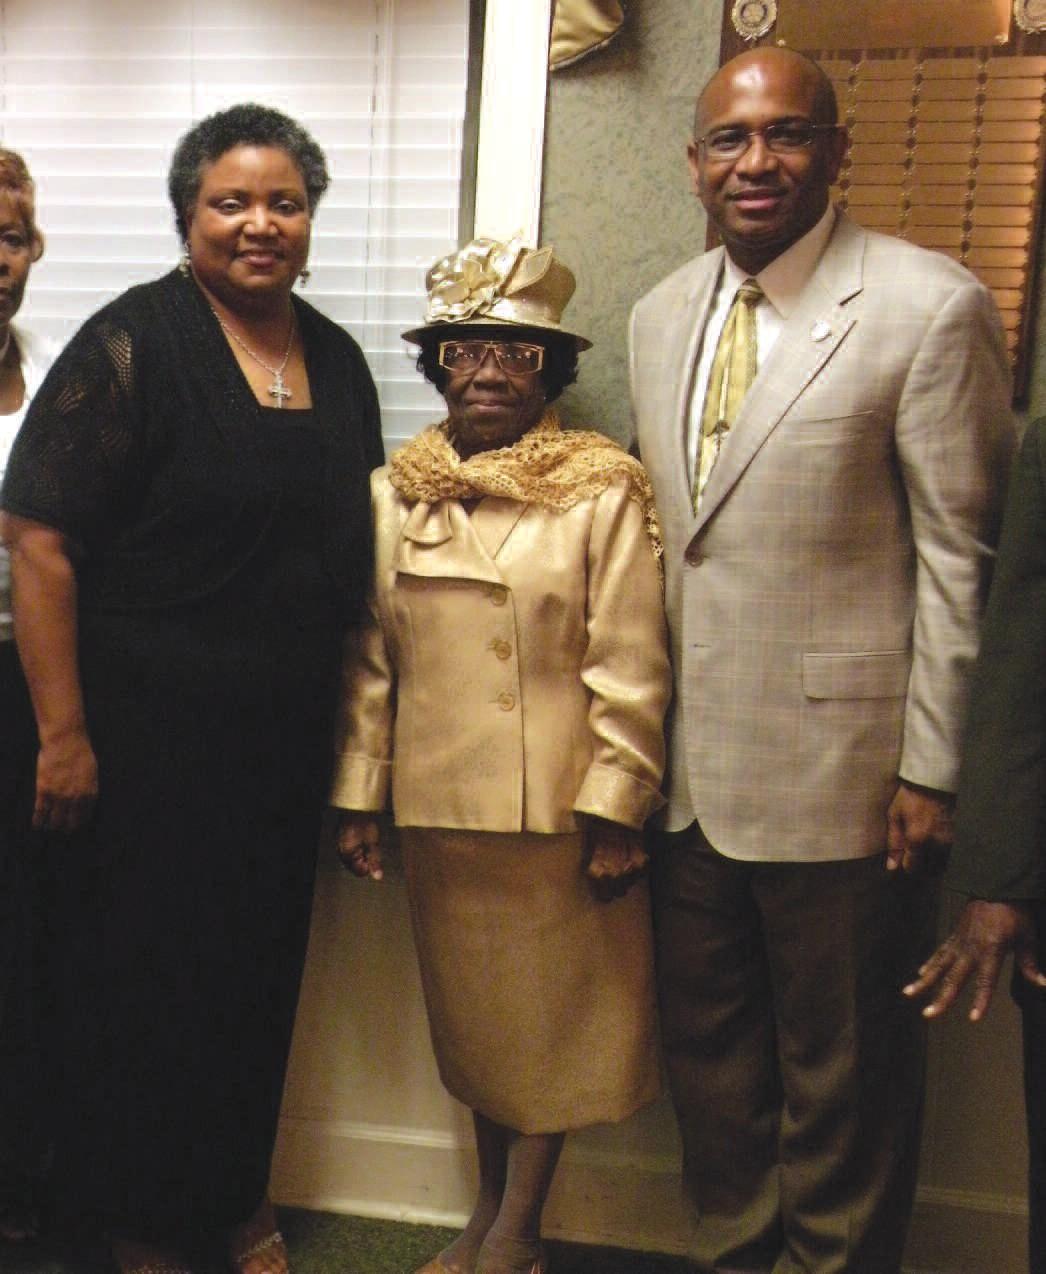 Dr. Diane Evans, Prophetess Hazel Scott and State Senator Lester Jackson